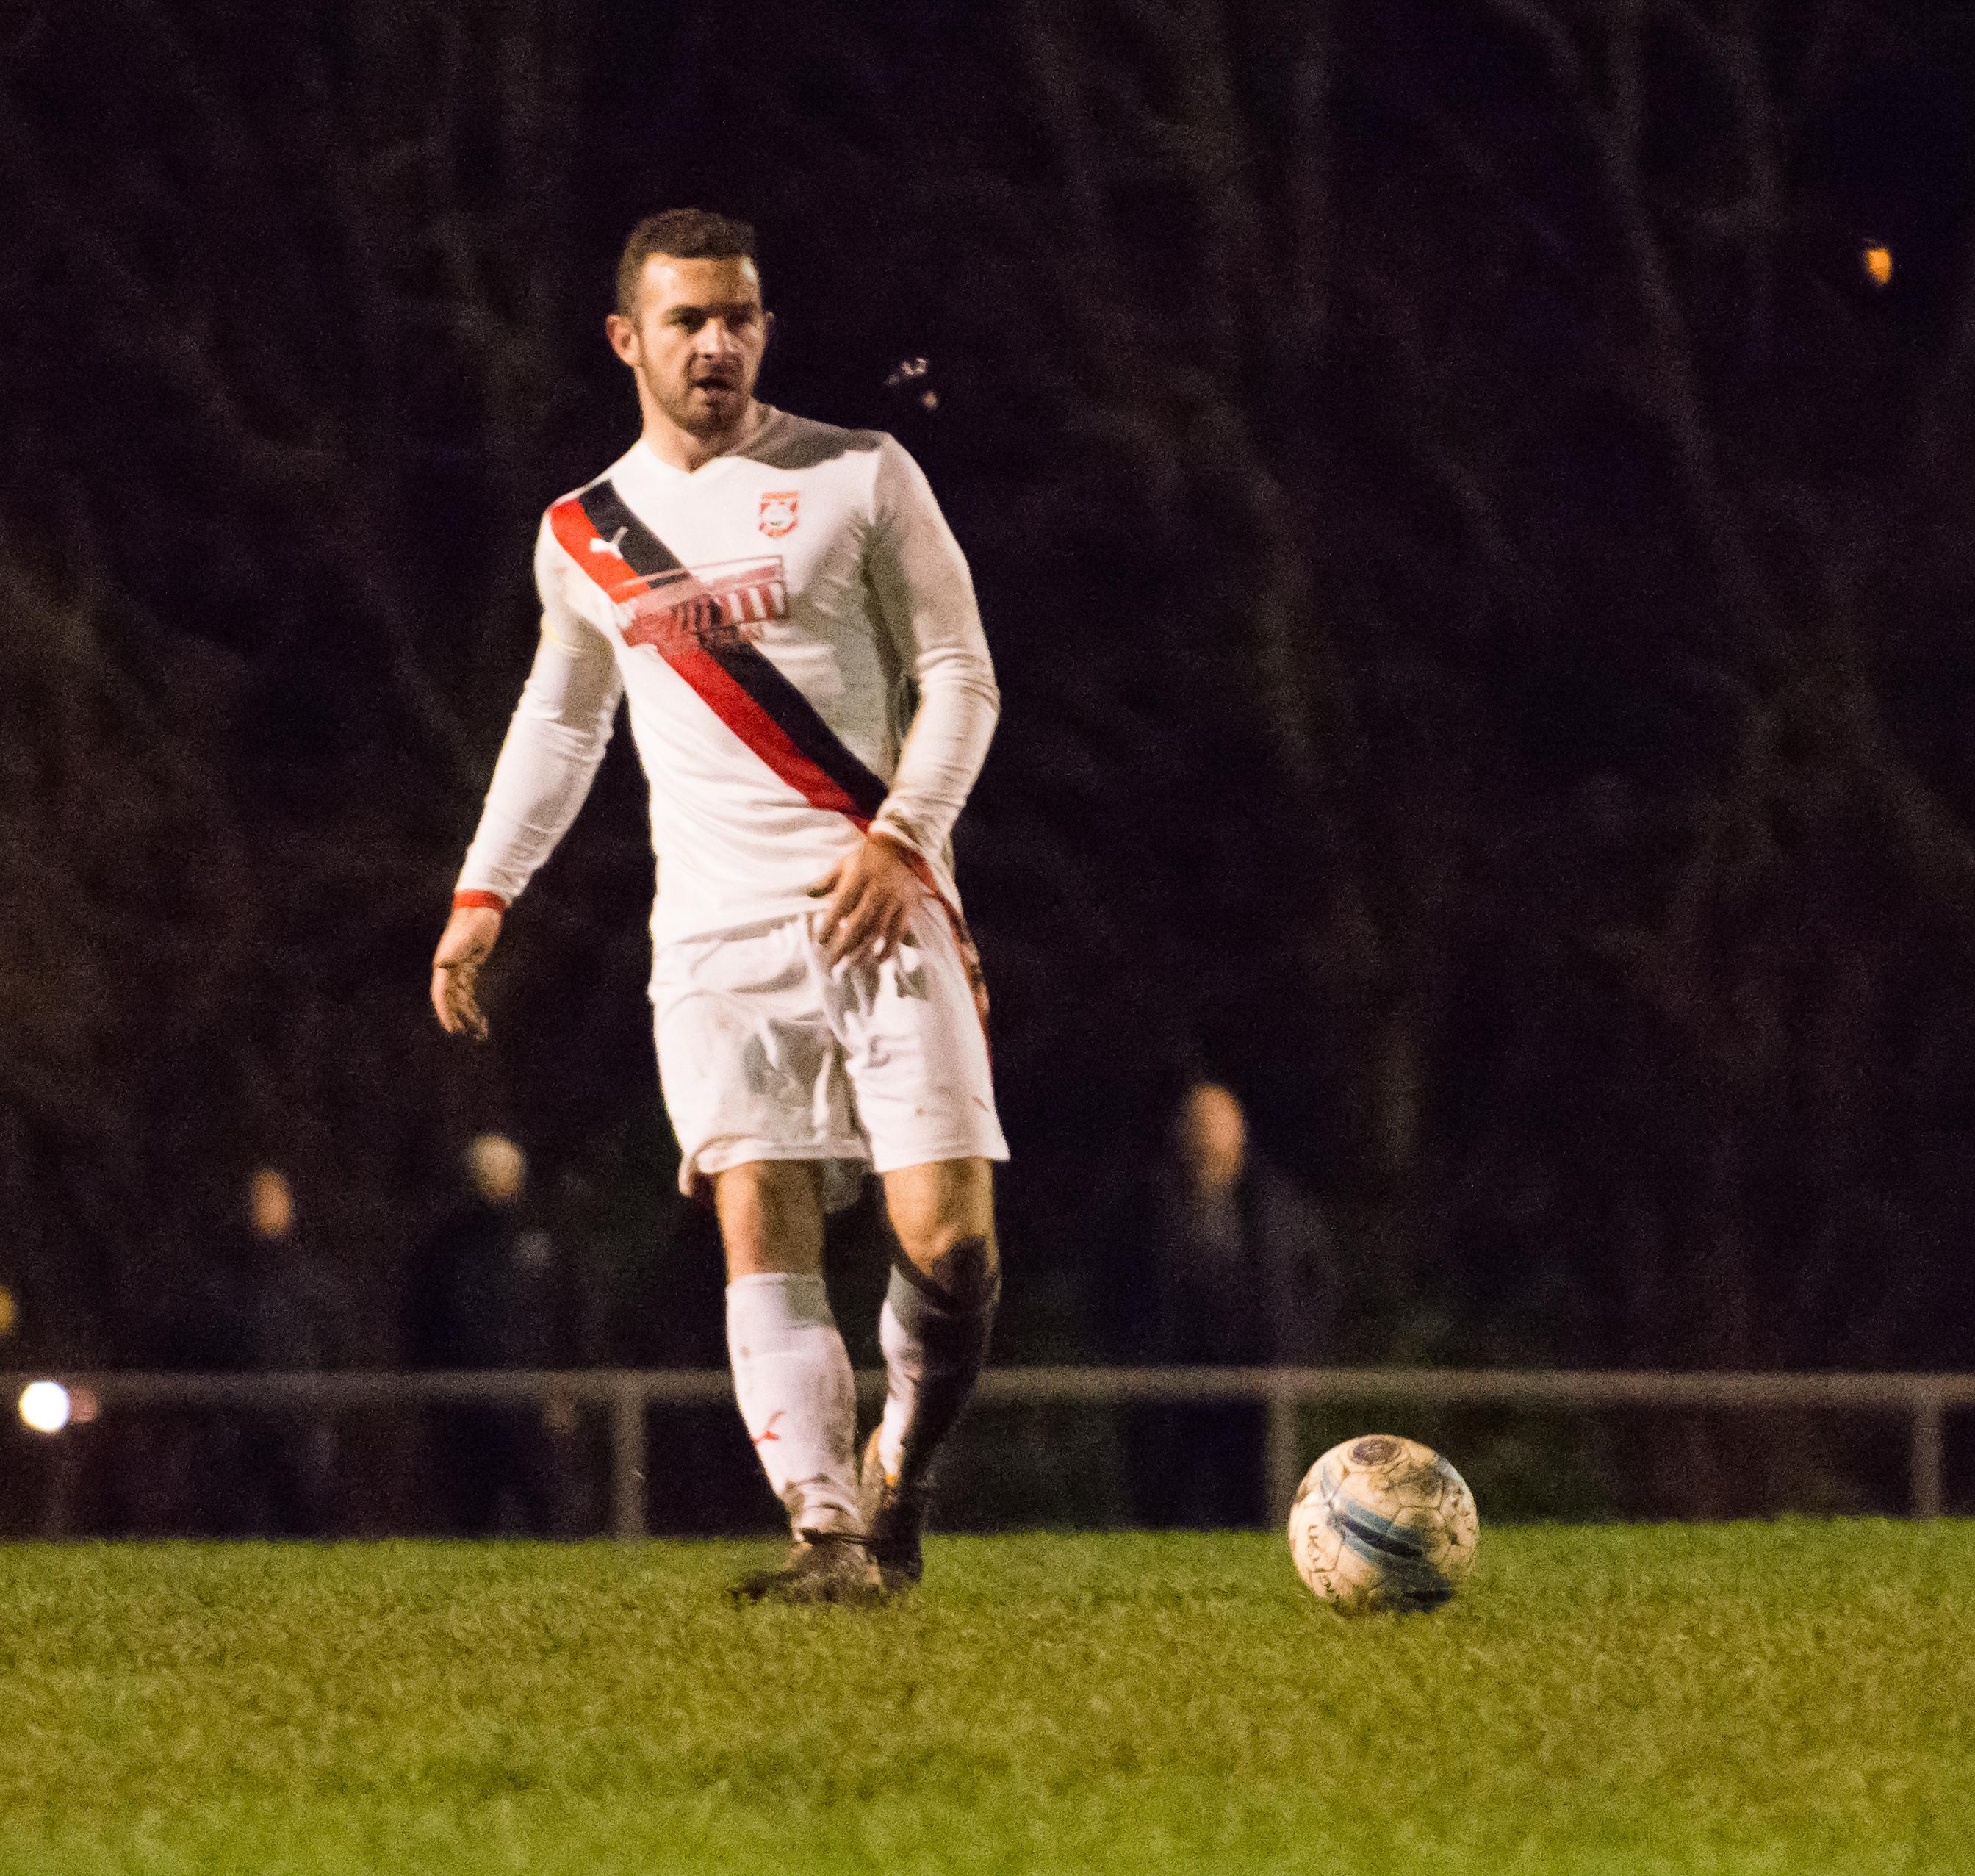 Mile Oak U21s vs Southwick FC U21s 14.12.17 42